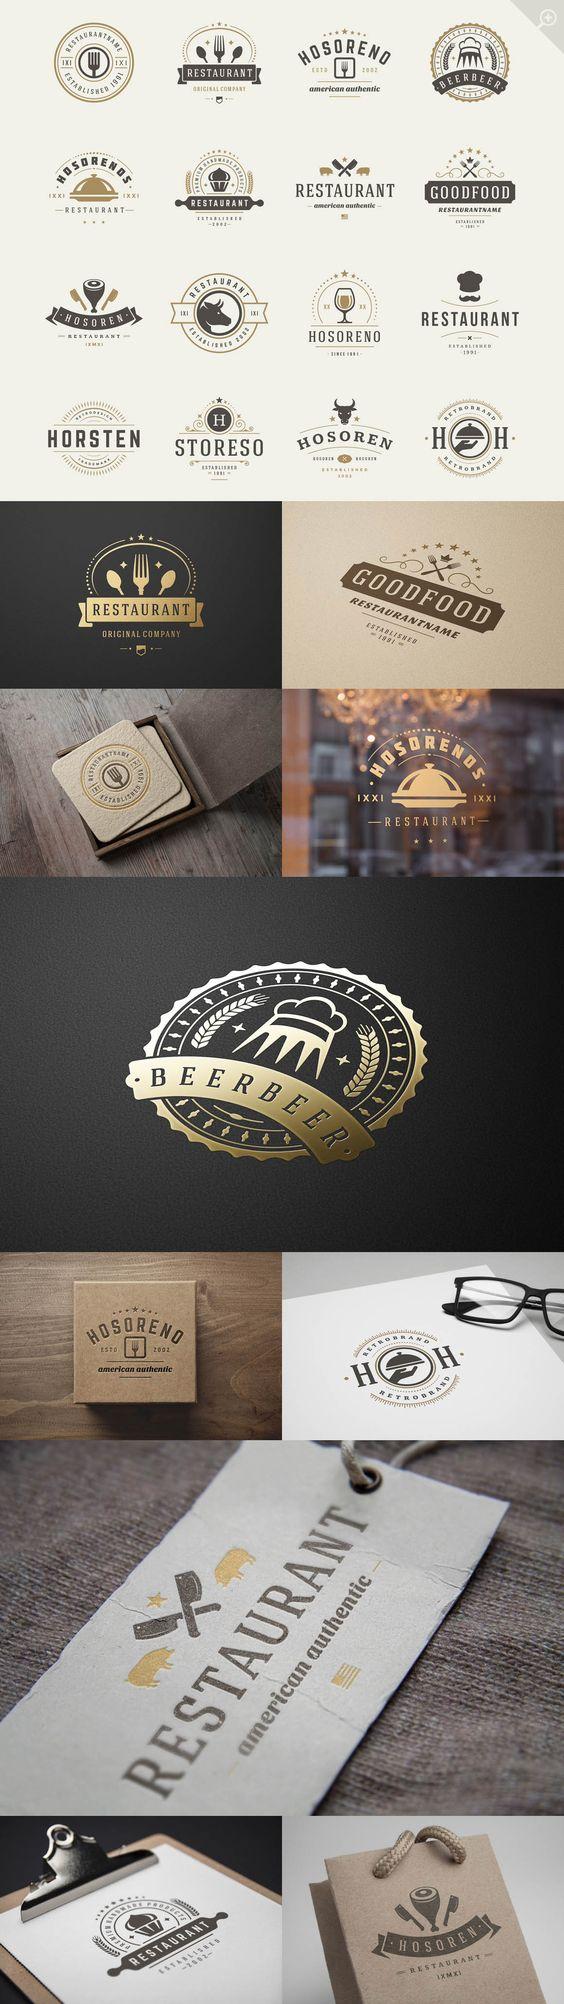 16 Restaurant Logotypes and Badges #design Buy Now: https://creativemarket.com/VasyaKo/324541-16-Restaurant-Logotypes-and-Badges?u=ksioks